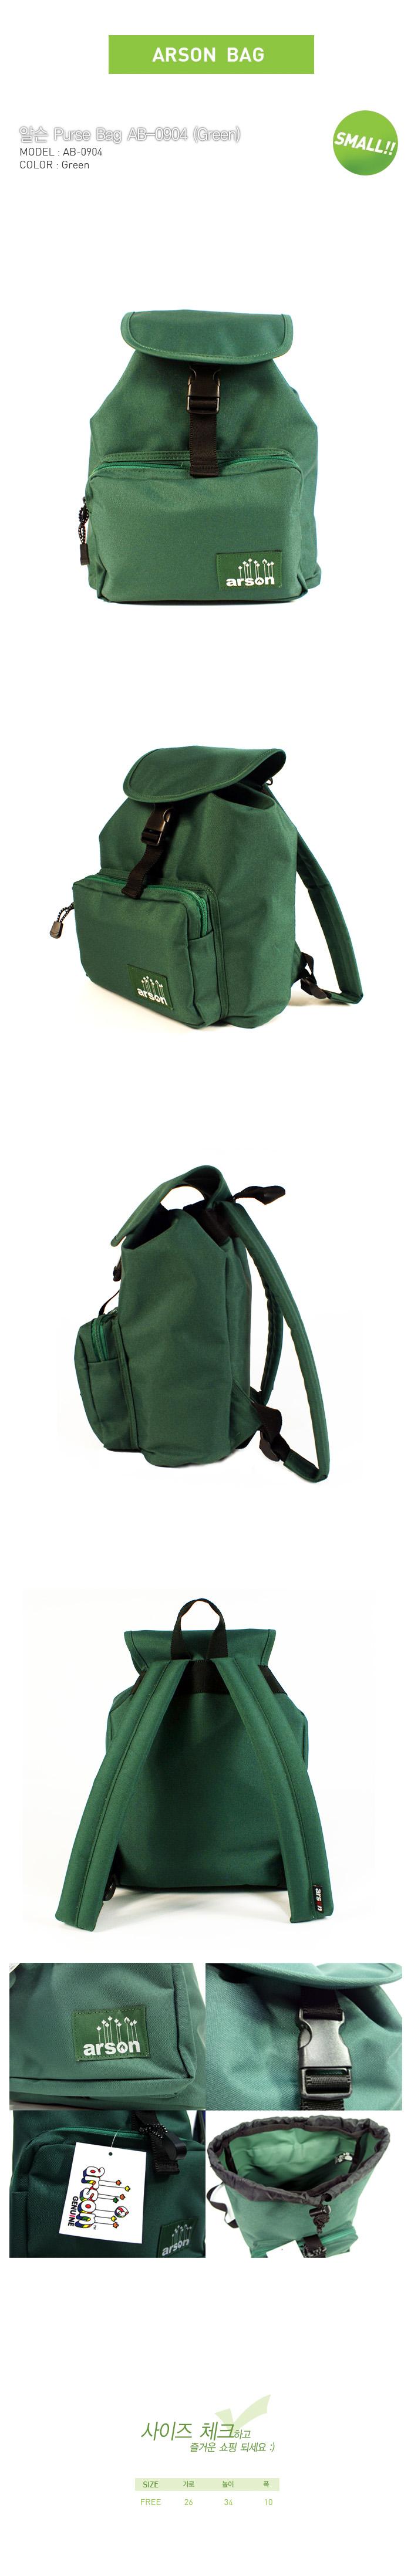 [ ARSON ] AB-0904(绿色)背包书包